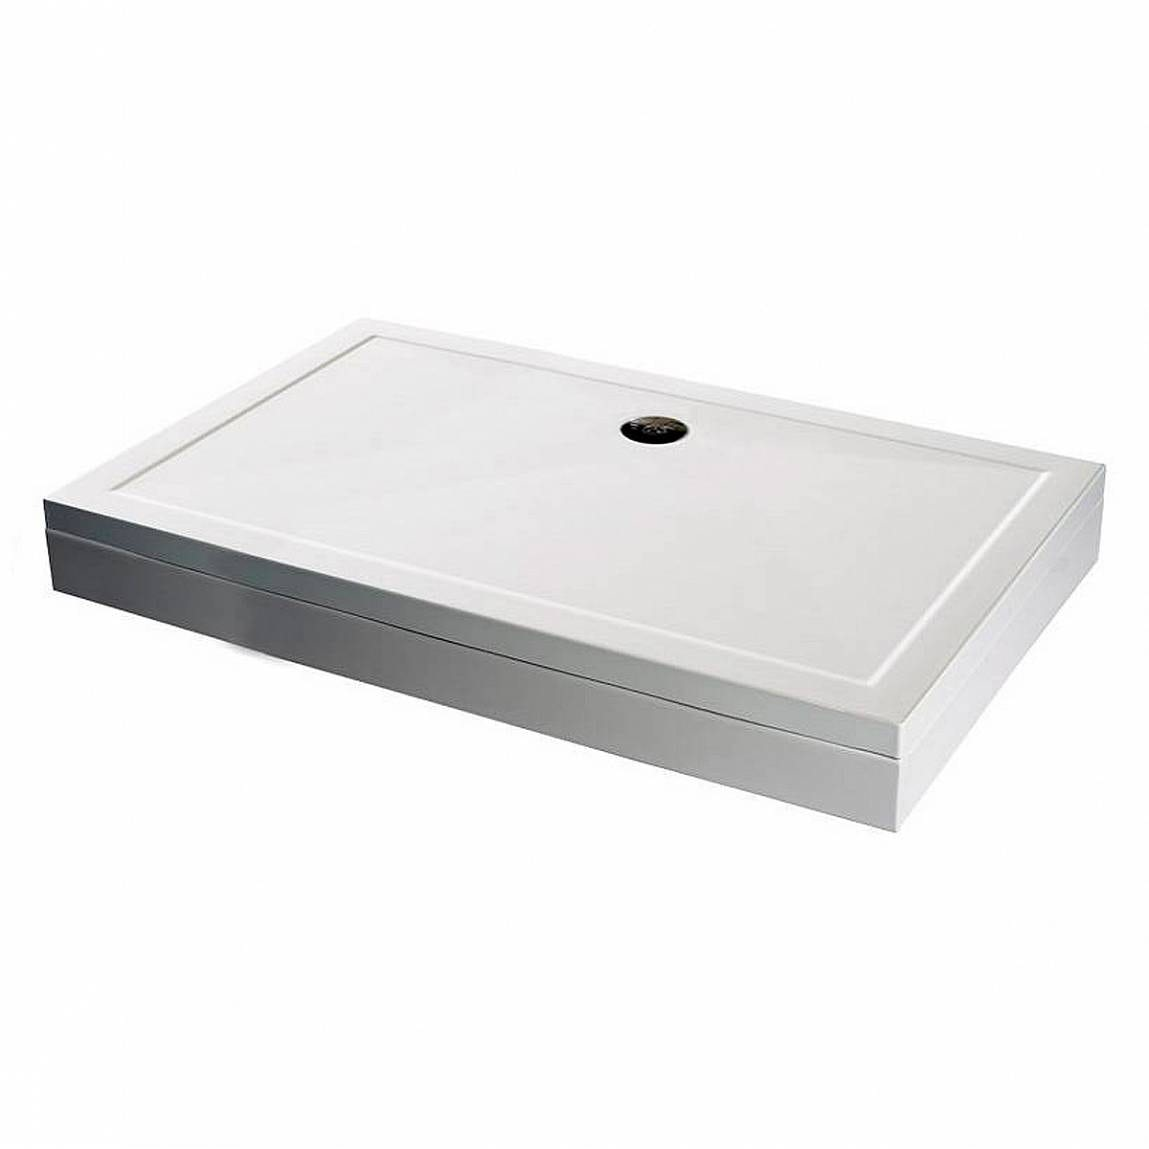 rectangular stone shower tray riser kit 800 x 700. Black Bedroom Furniture Sets. Home Design Ideas